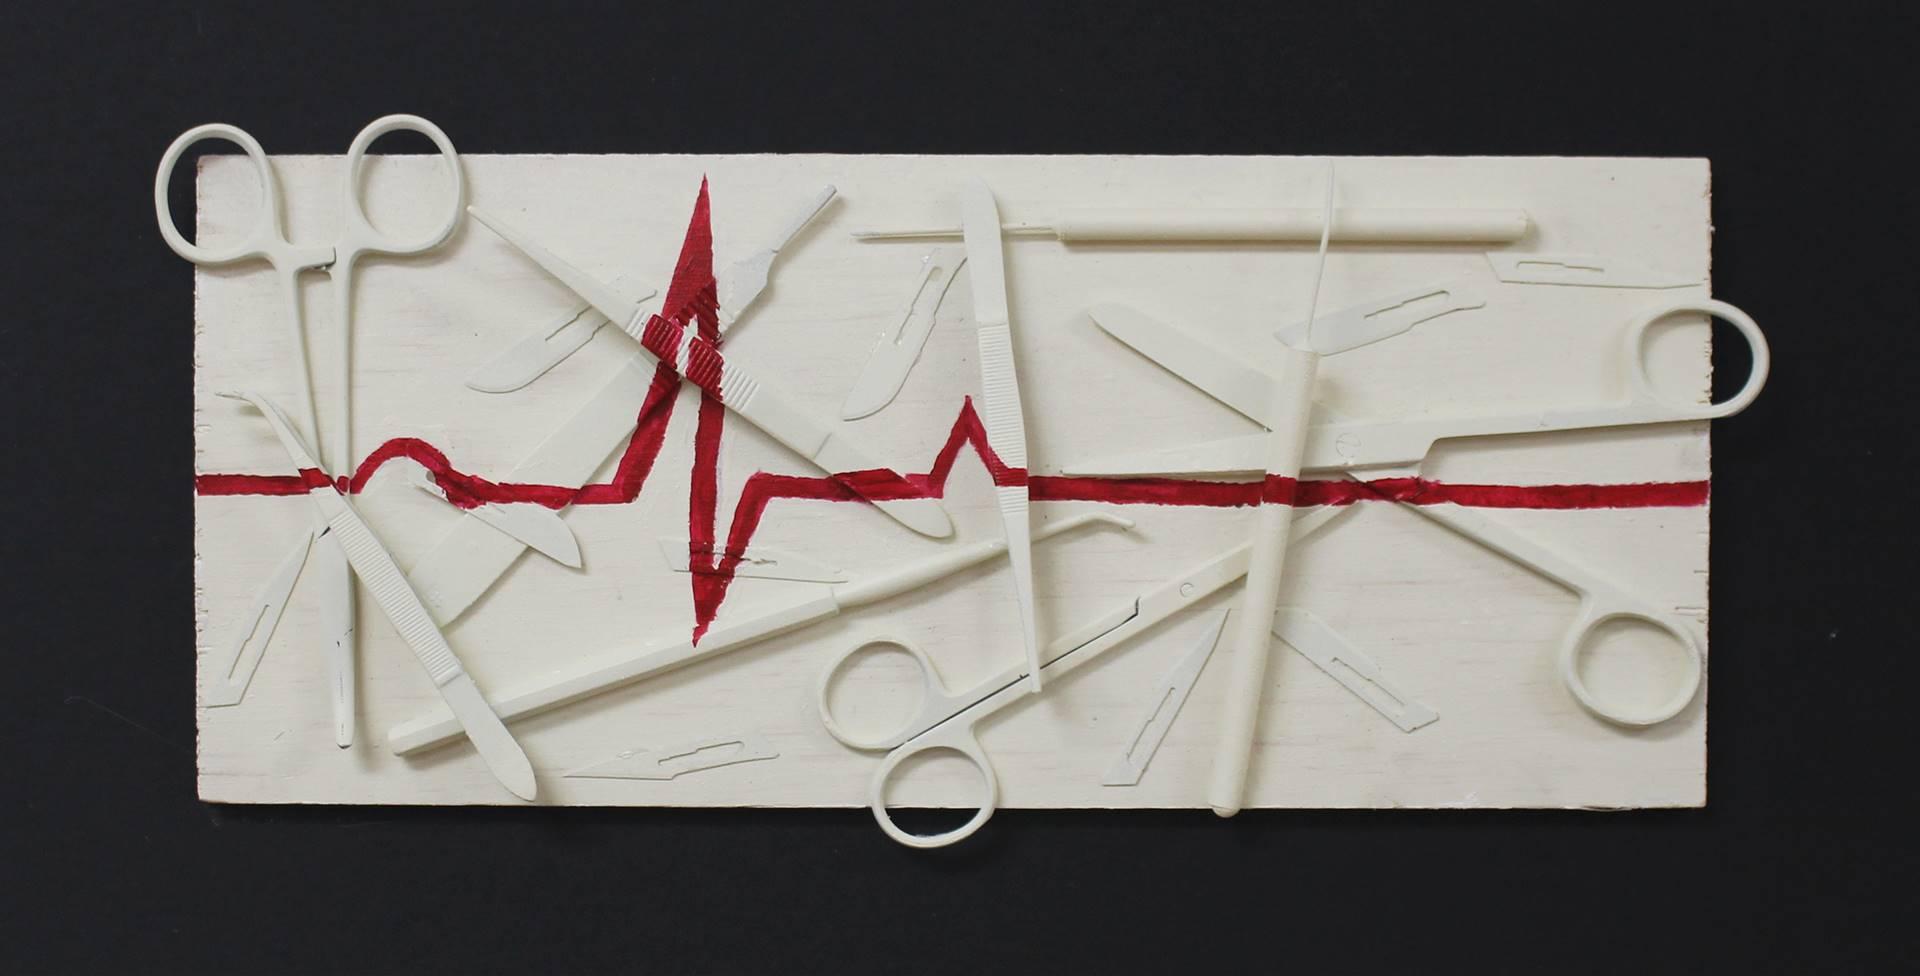 Flatline, Claire Ockner